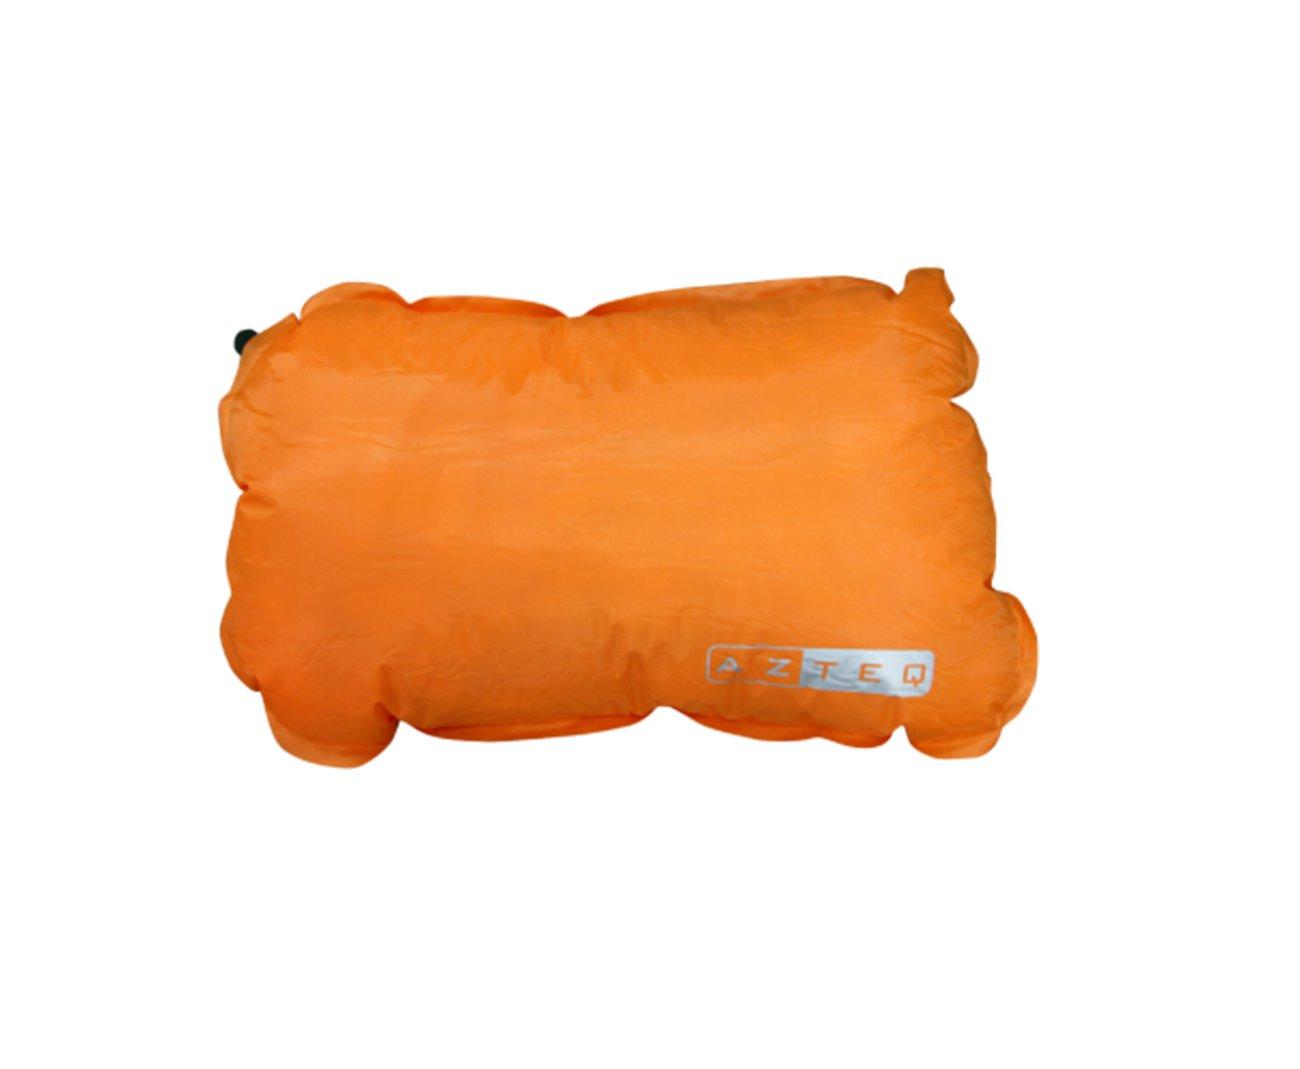 Travesseiro Inflavel Looper - Azteq